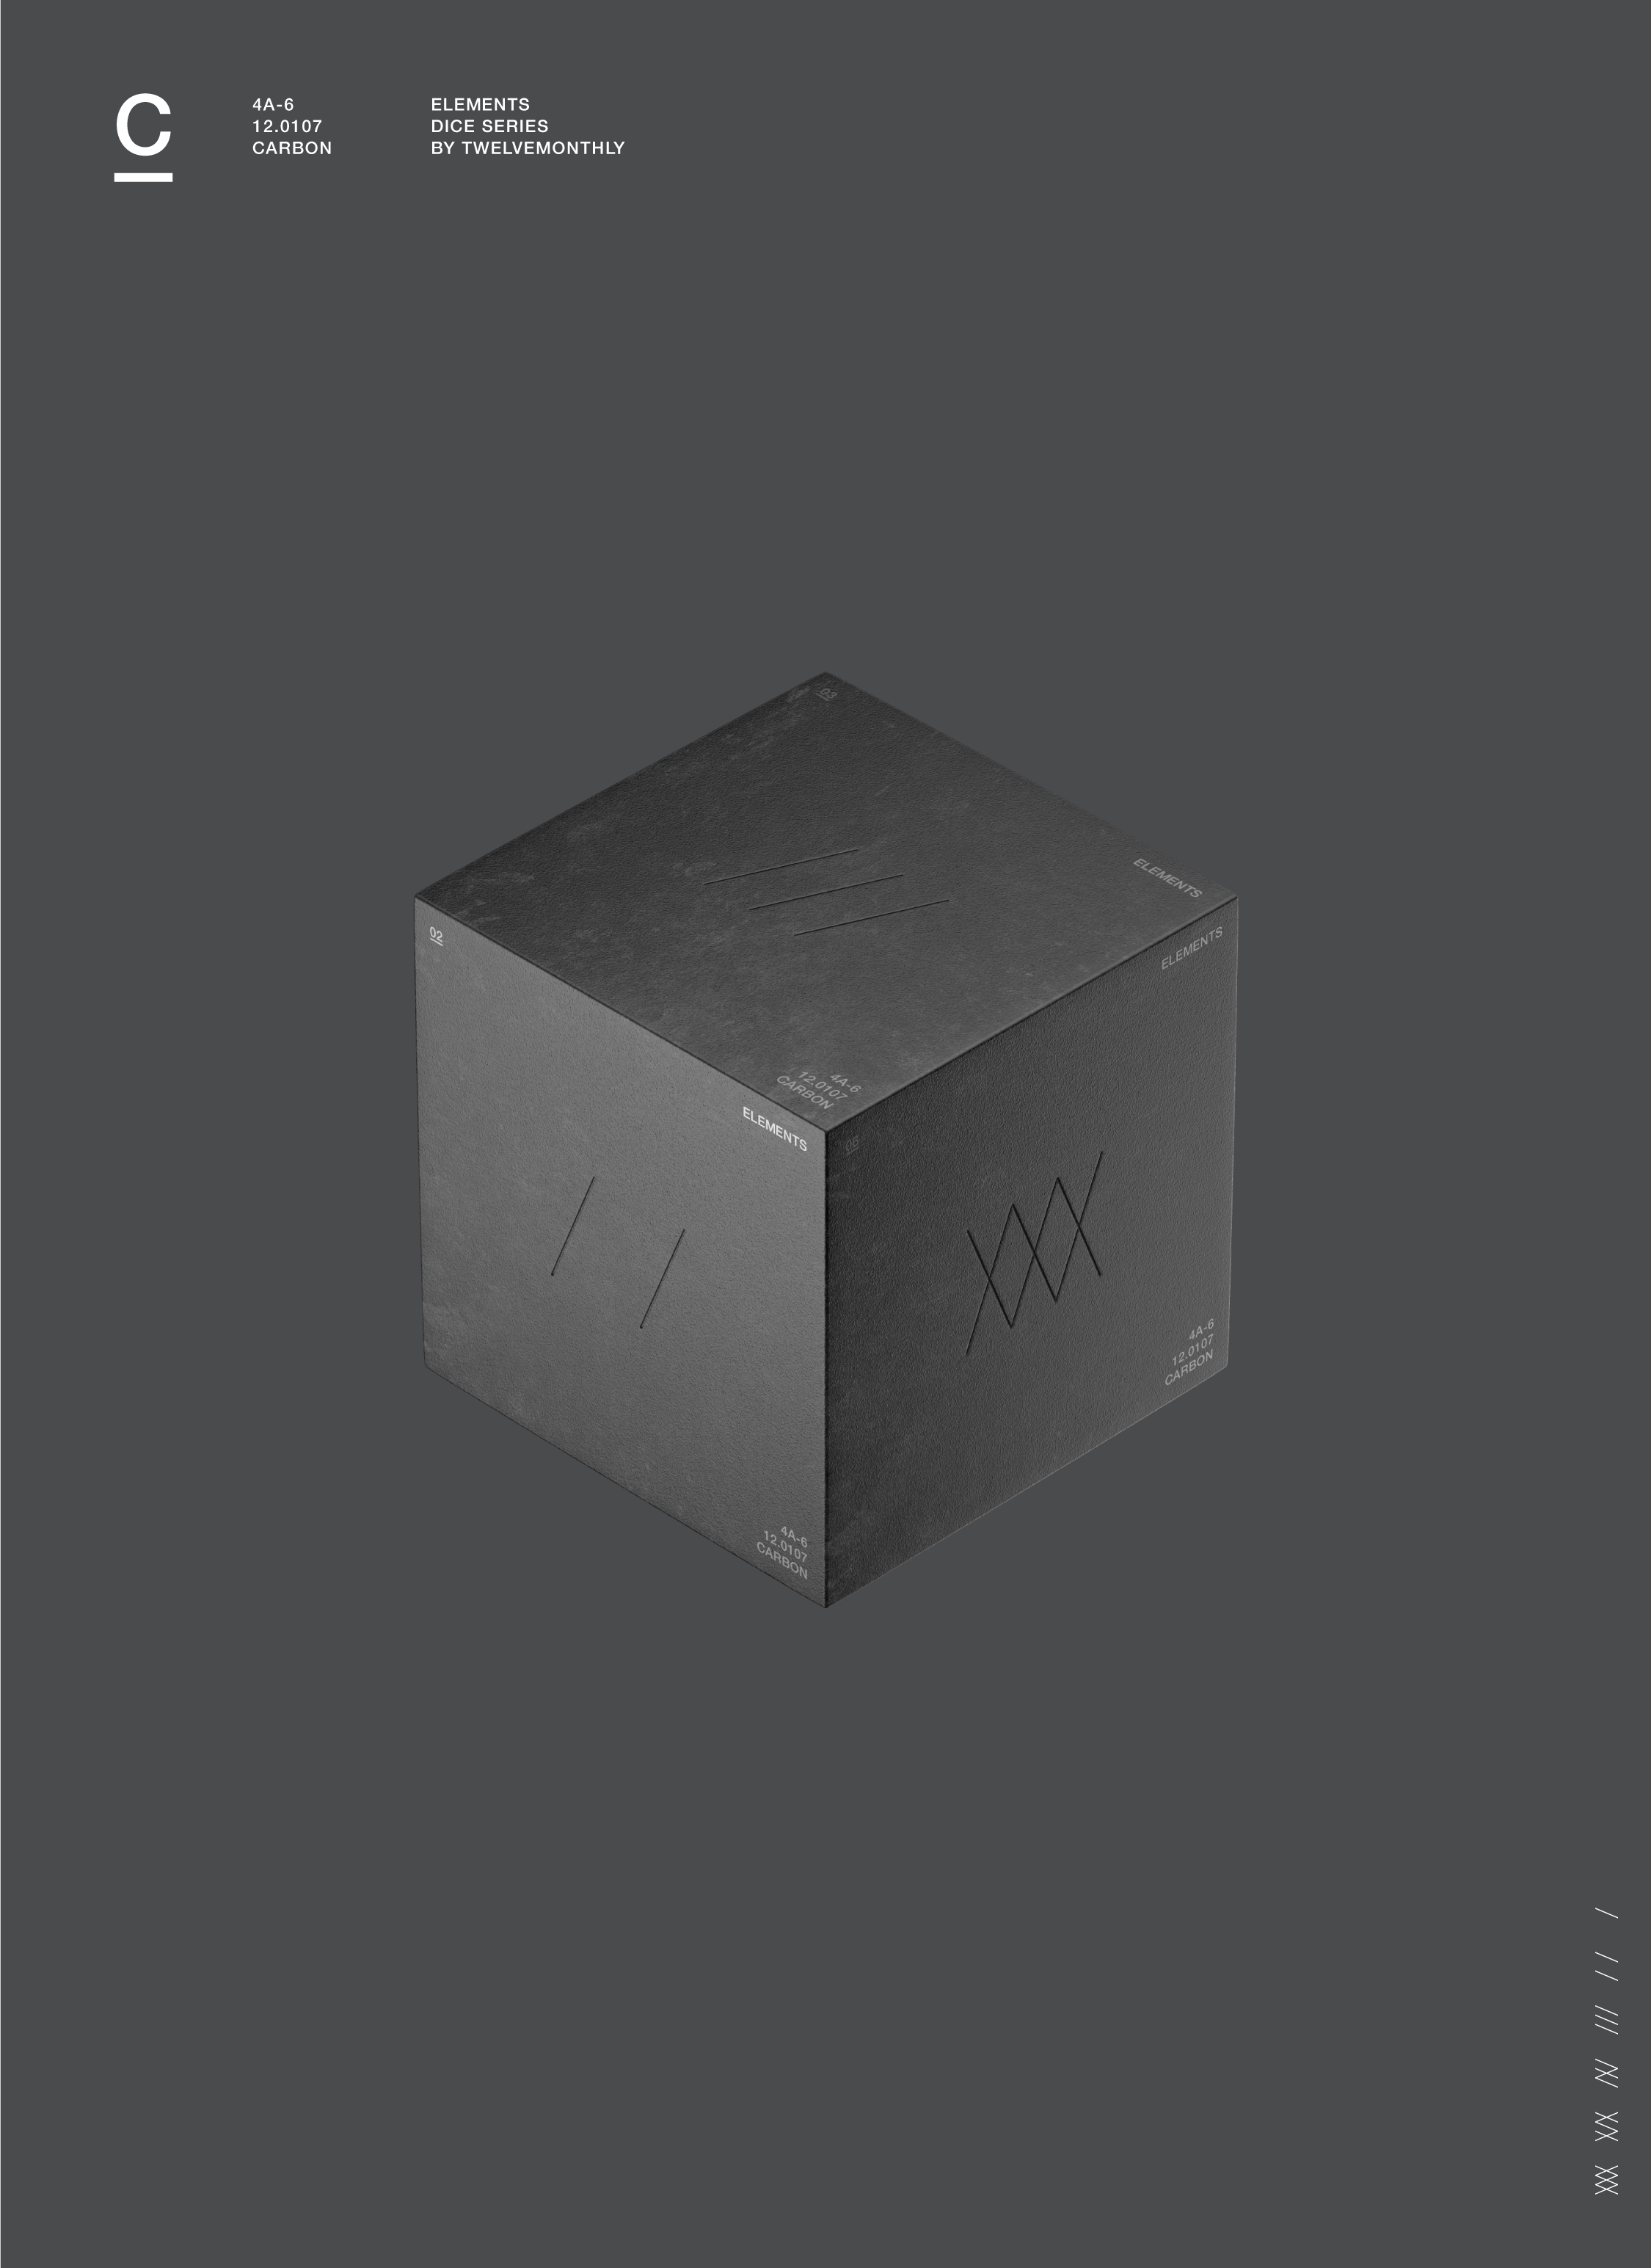 12_elements_poster_carbon.jpg